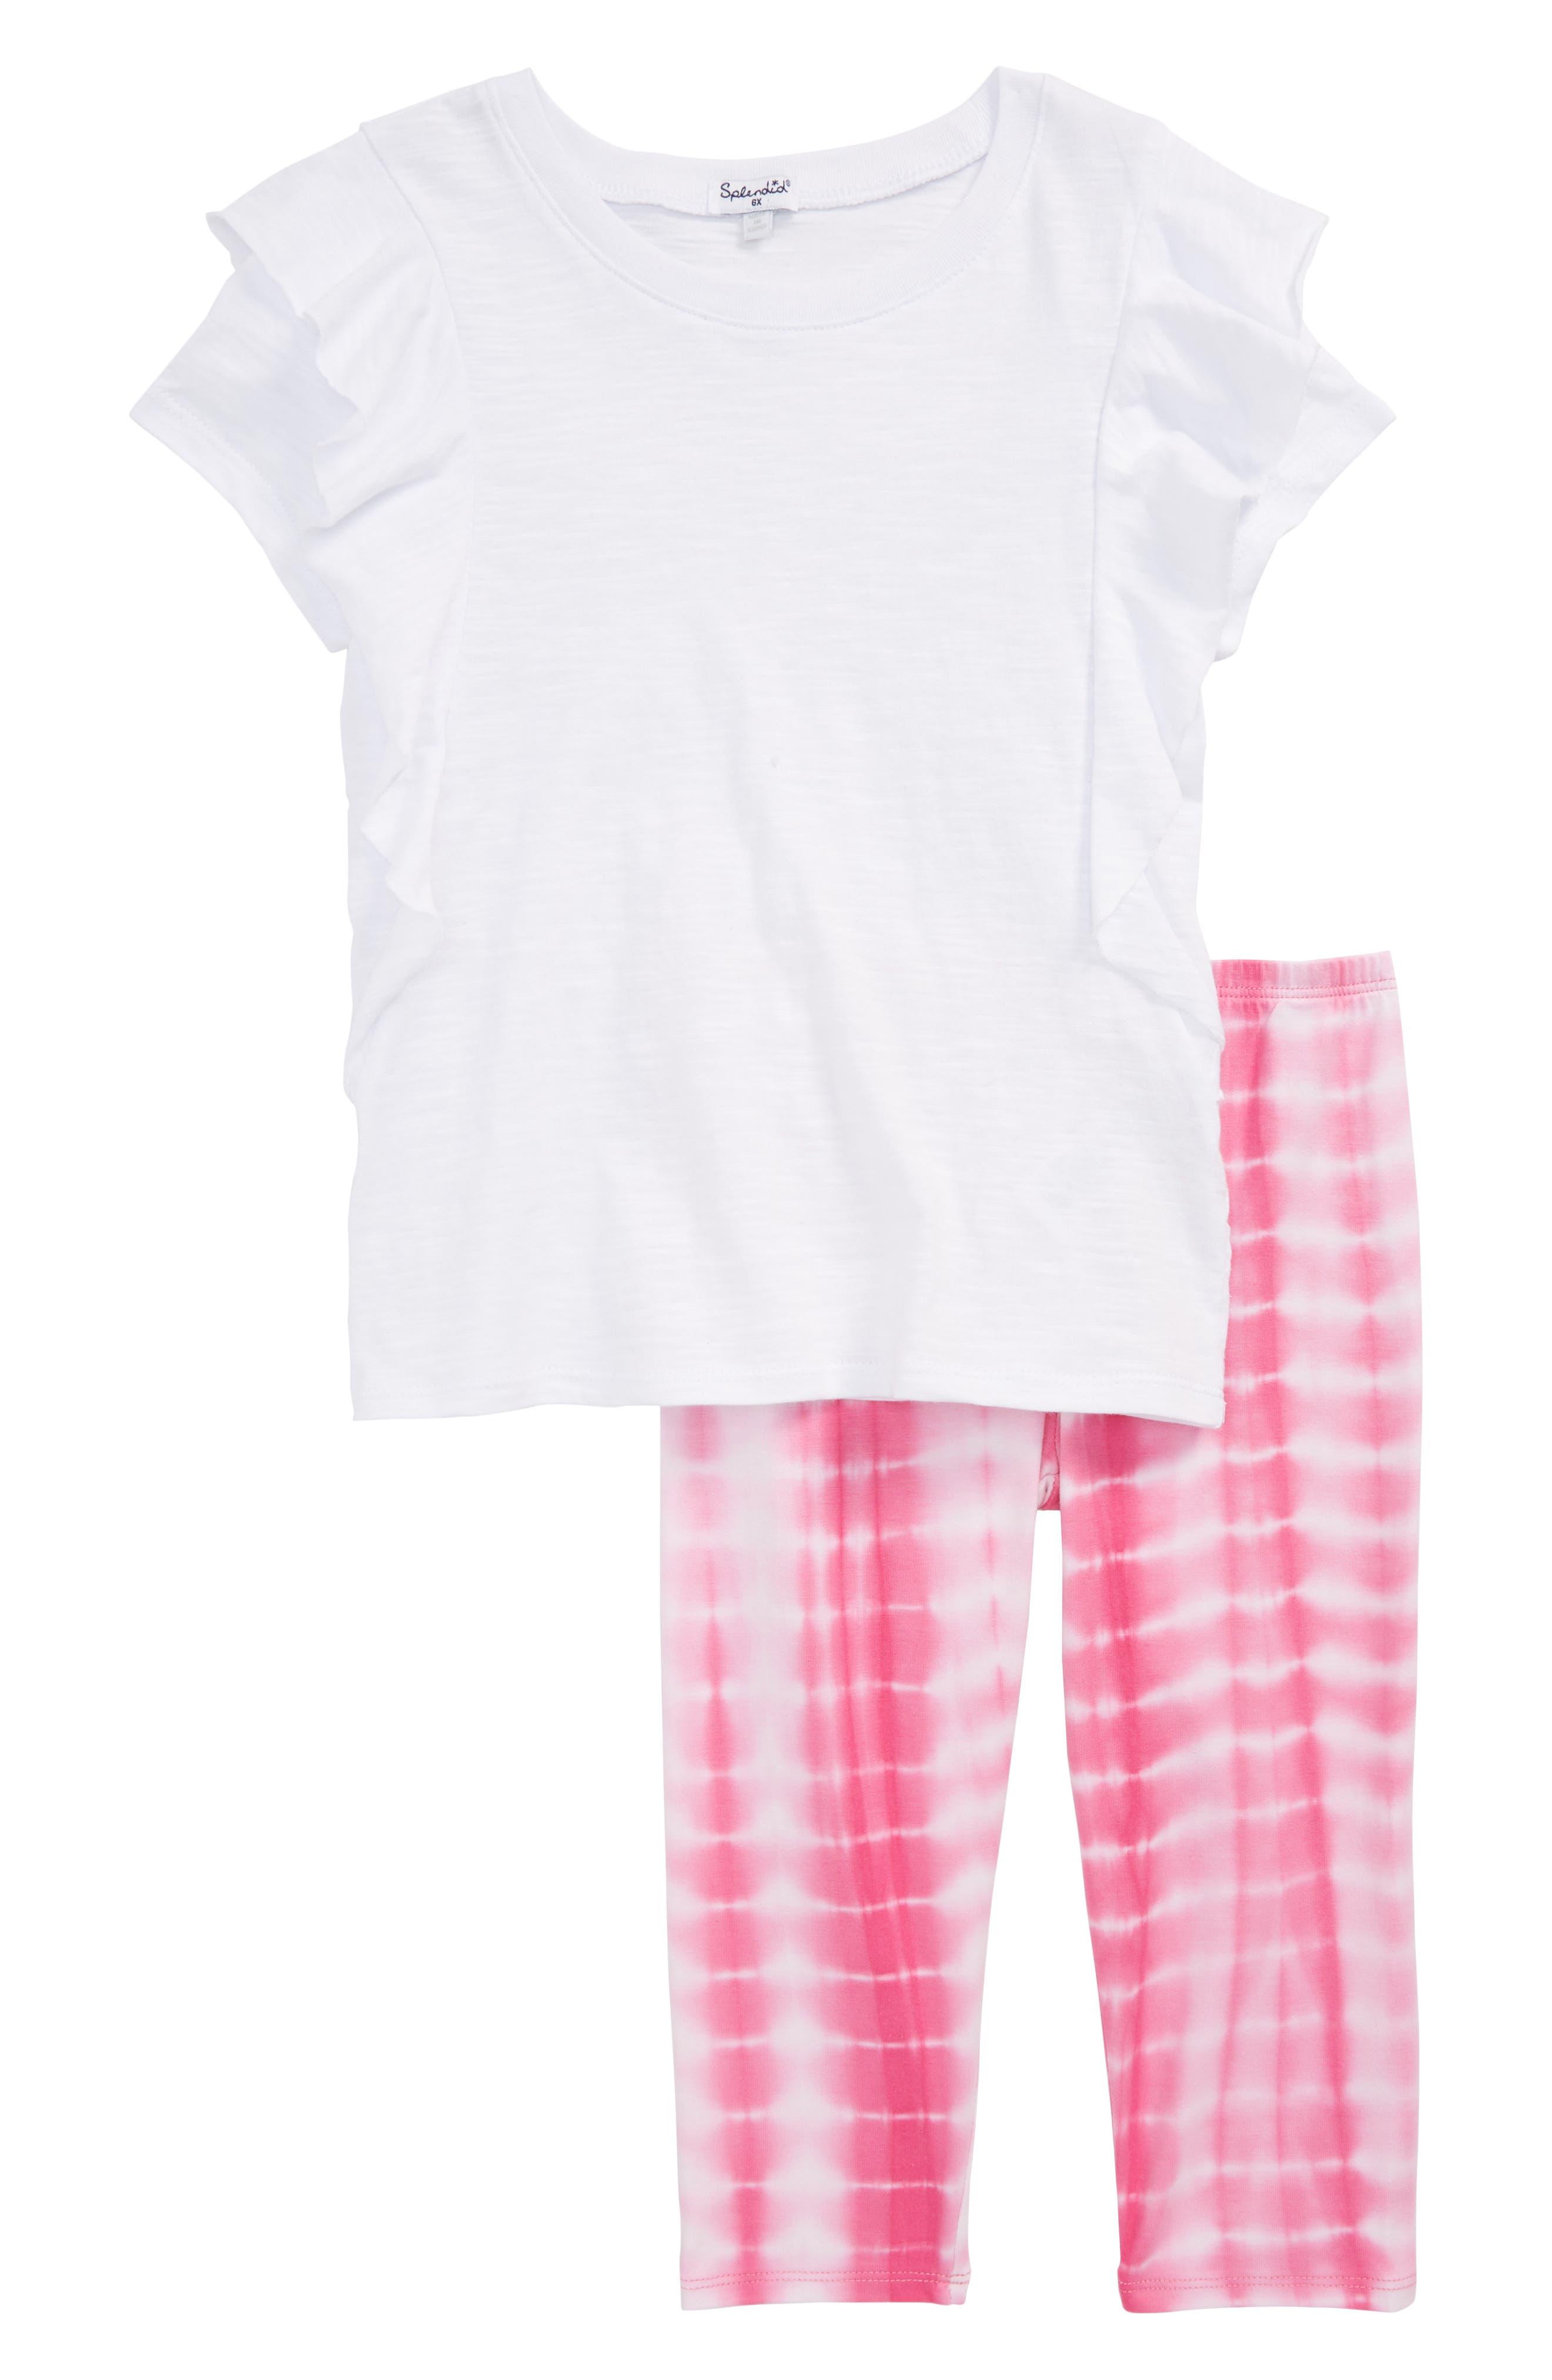 Slub Tee & Tie Dye Leggings Set,                             Main thumbnail 1, color,                             100